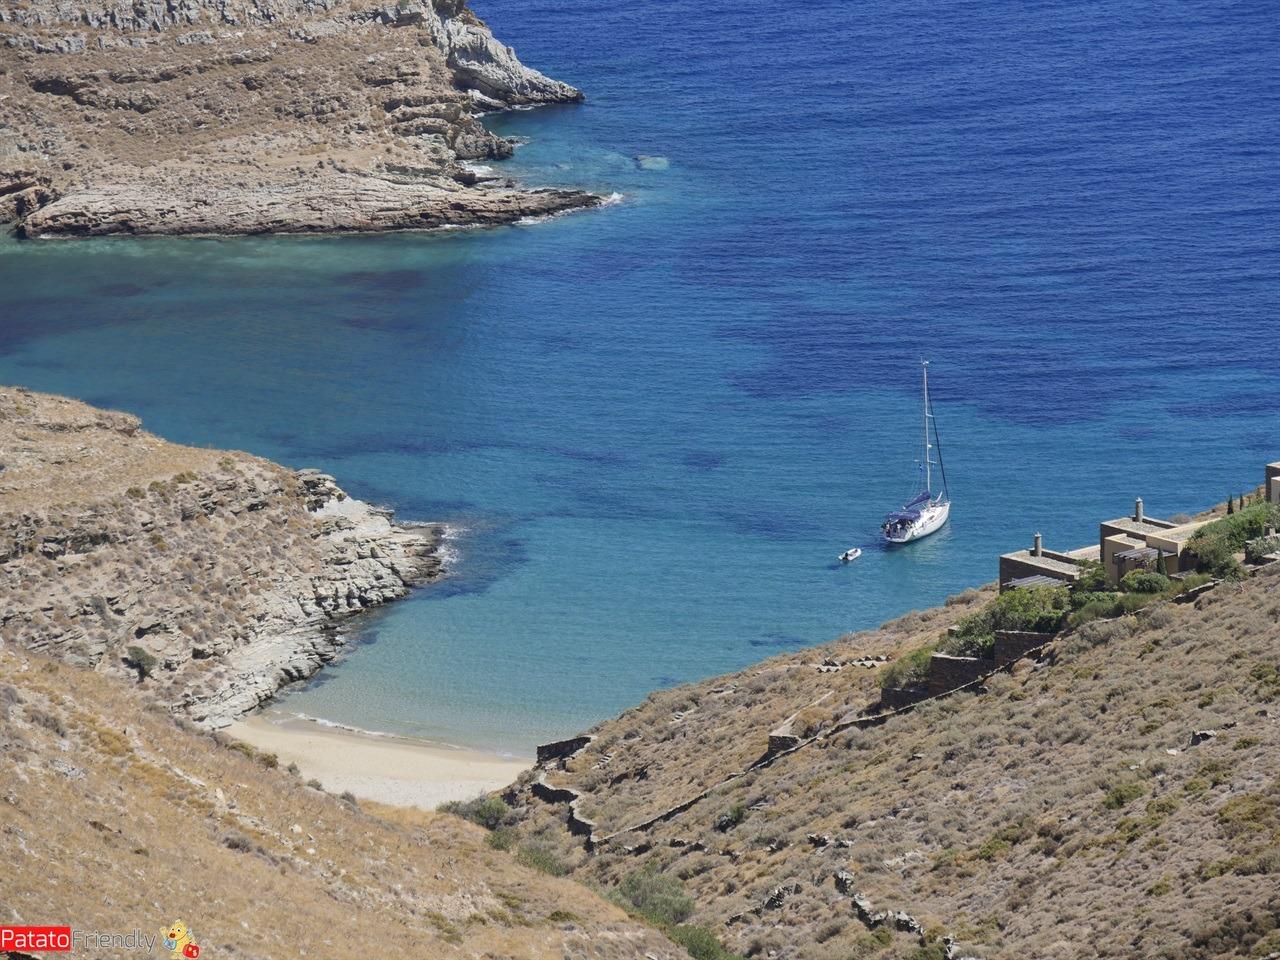 [cml_media_alt id='12227']Isola di Kea - La deserta spiaggia di Psili Ammos[/cml_media_alt]